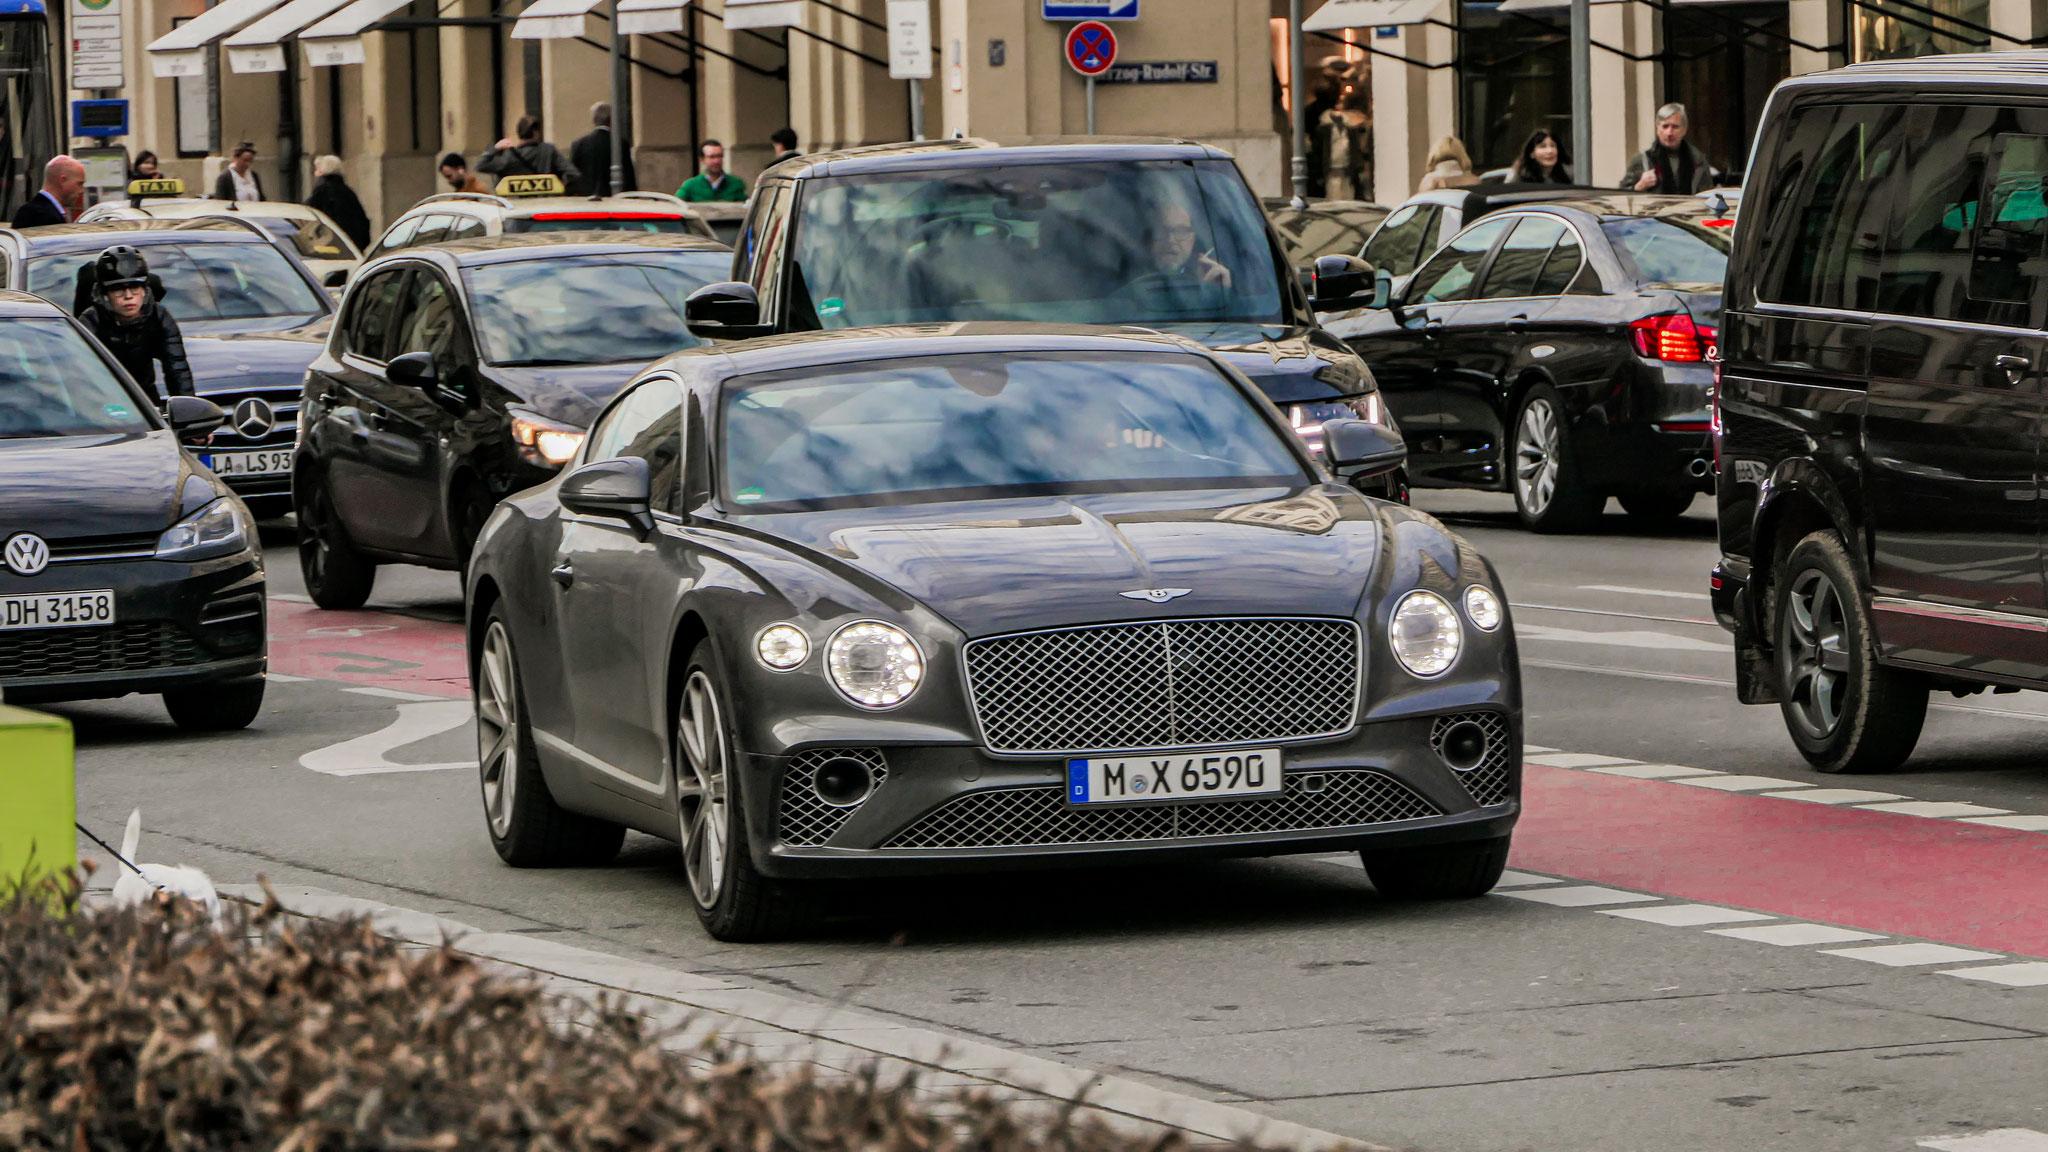 Bentley Continental GT - M-X-6590